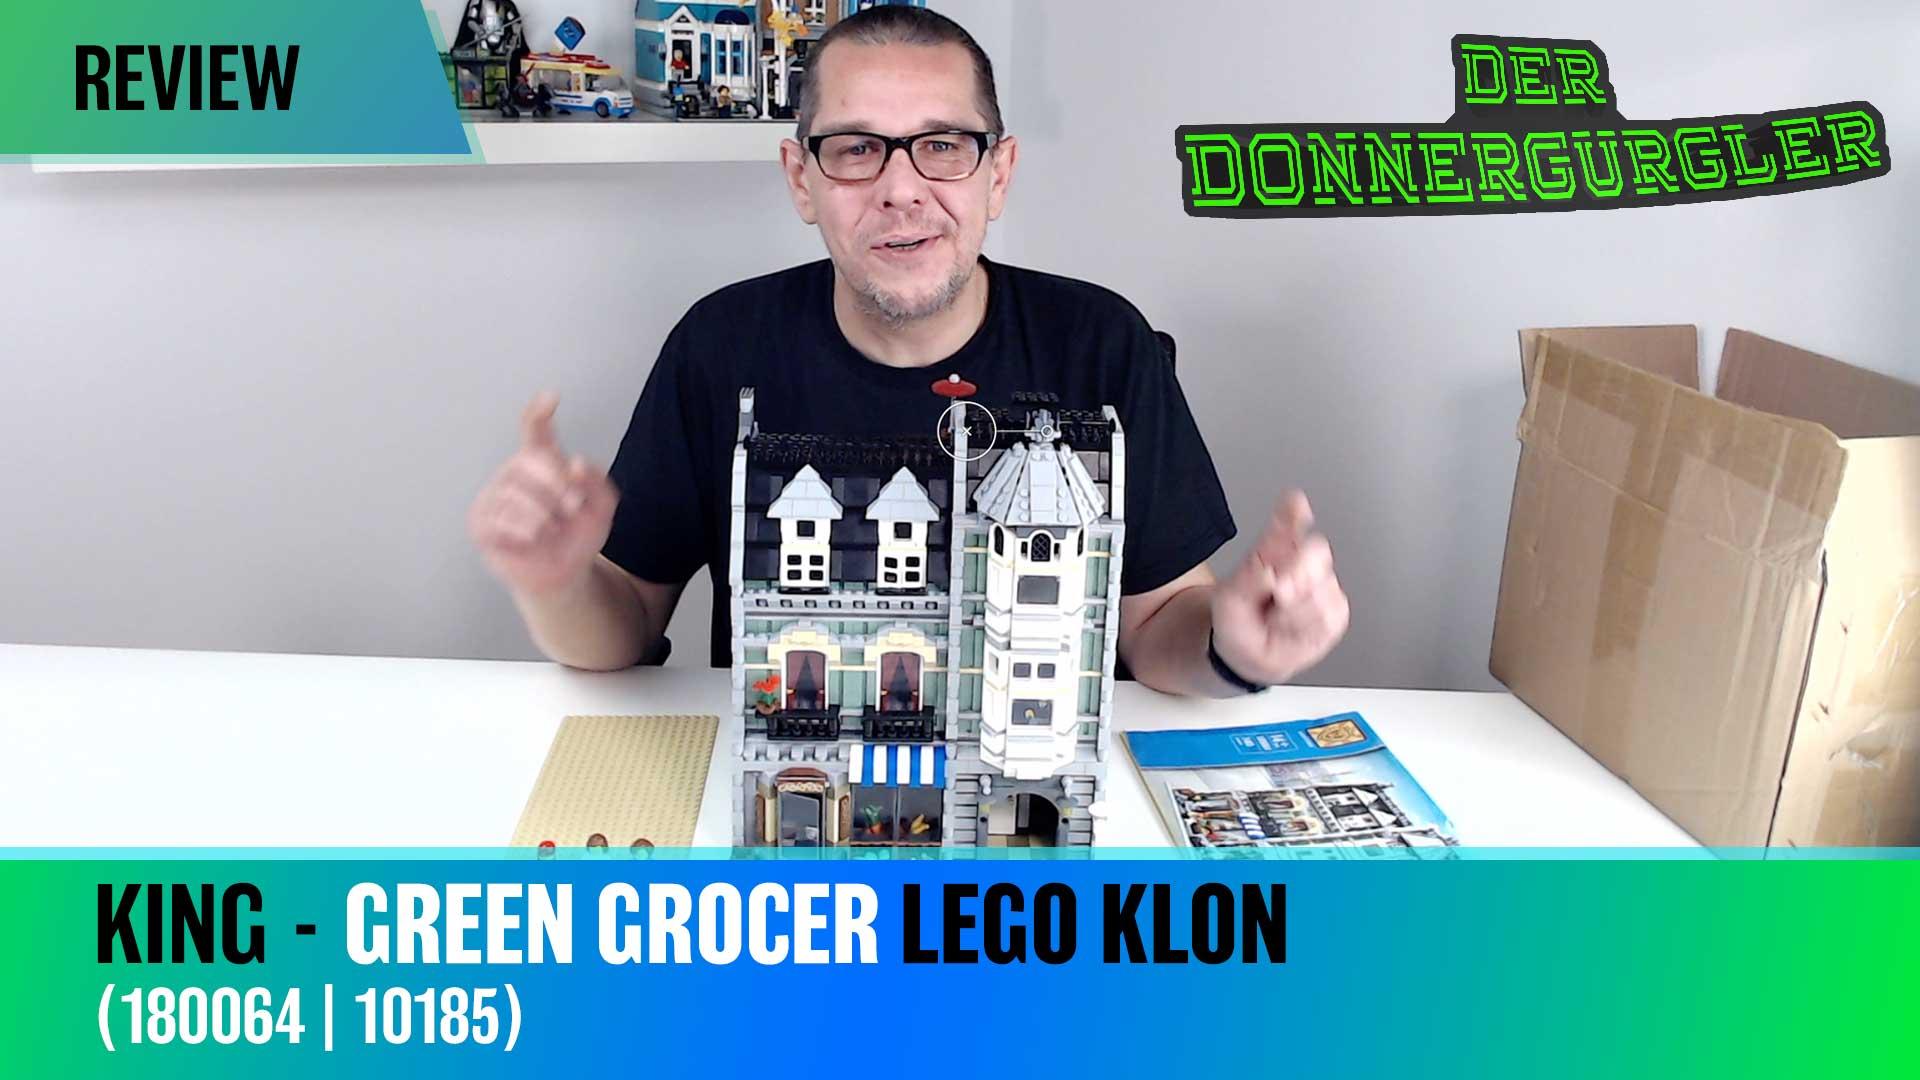 Lion King Green Grocer 180064 - Lego Modular Building Klon 10185